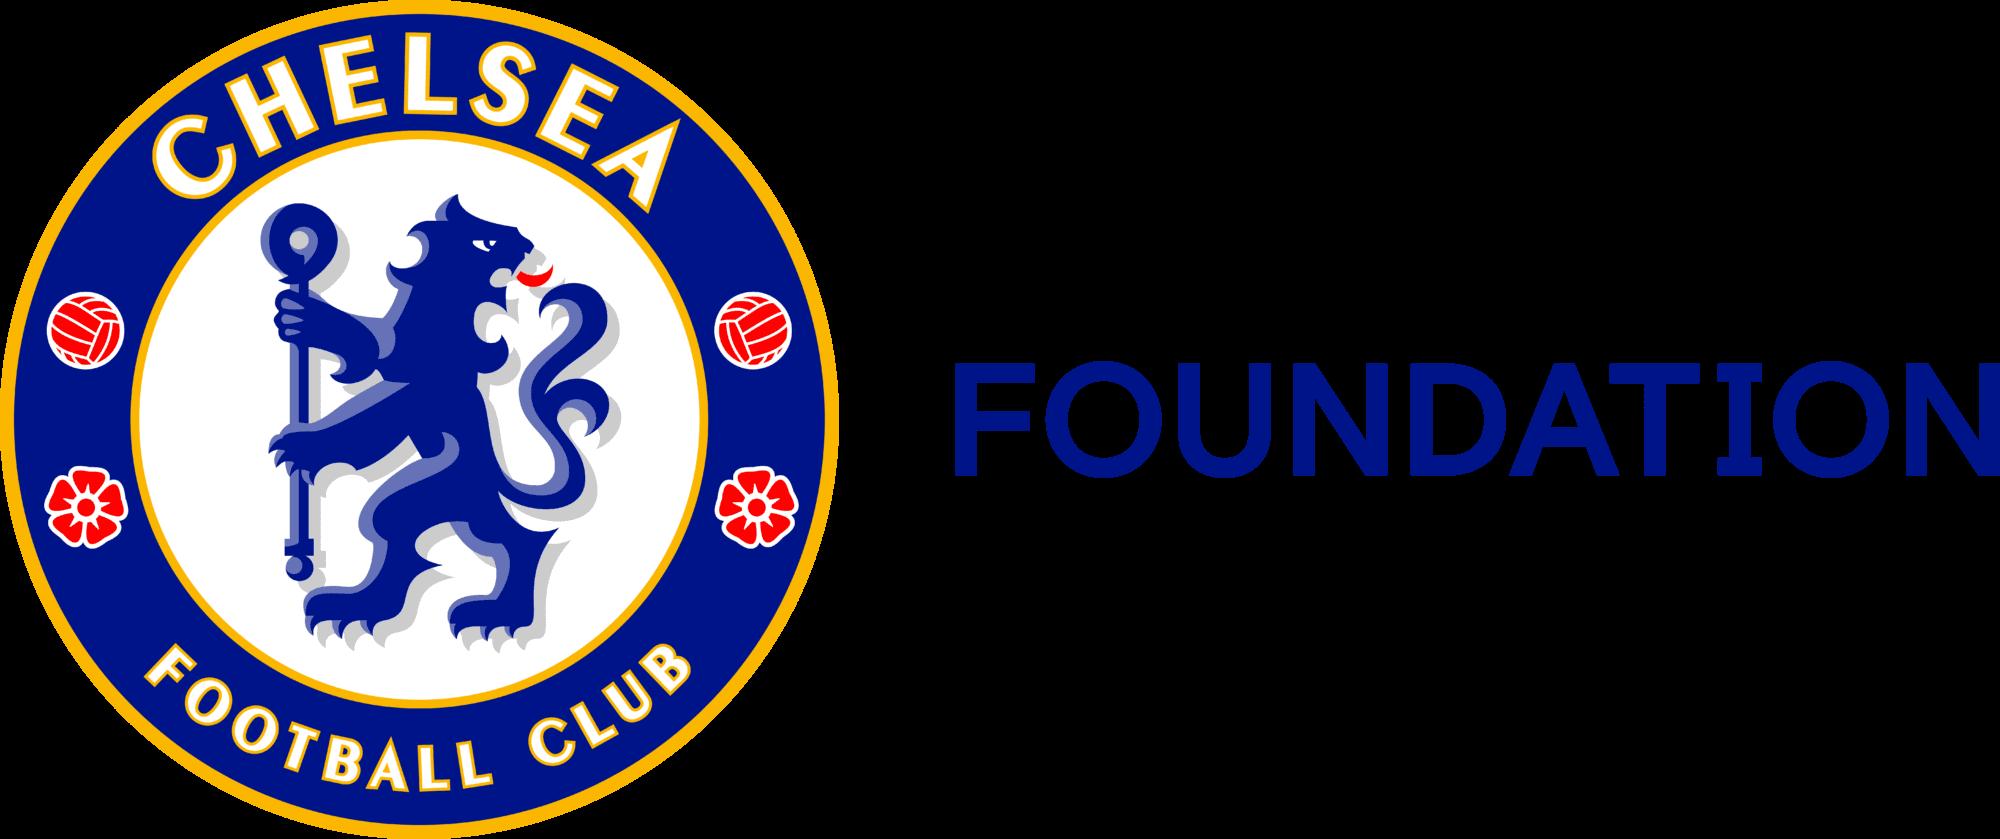 Chelsea Fc Foundation Inspiresport